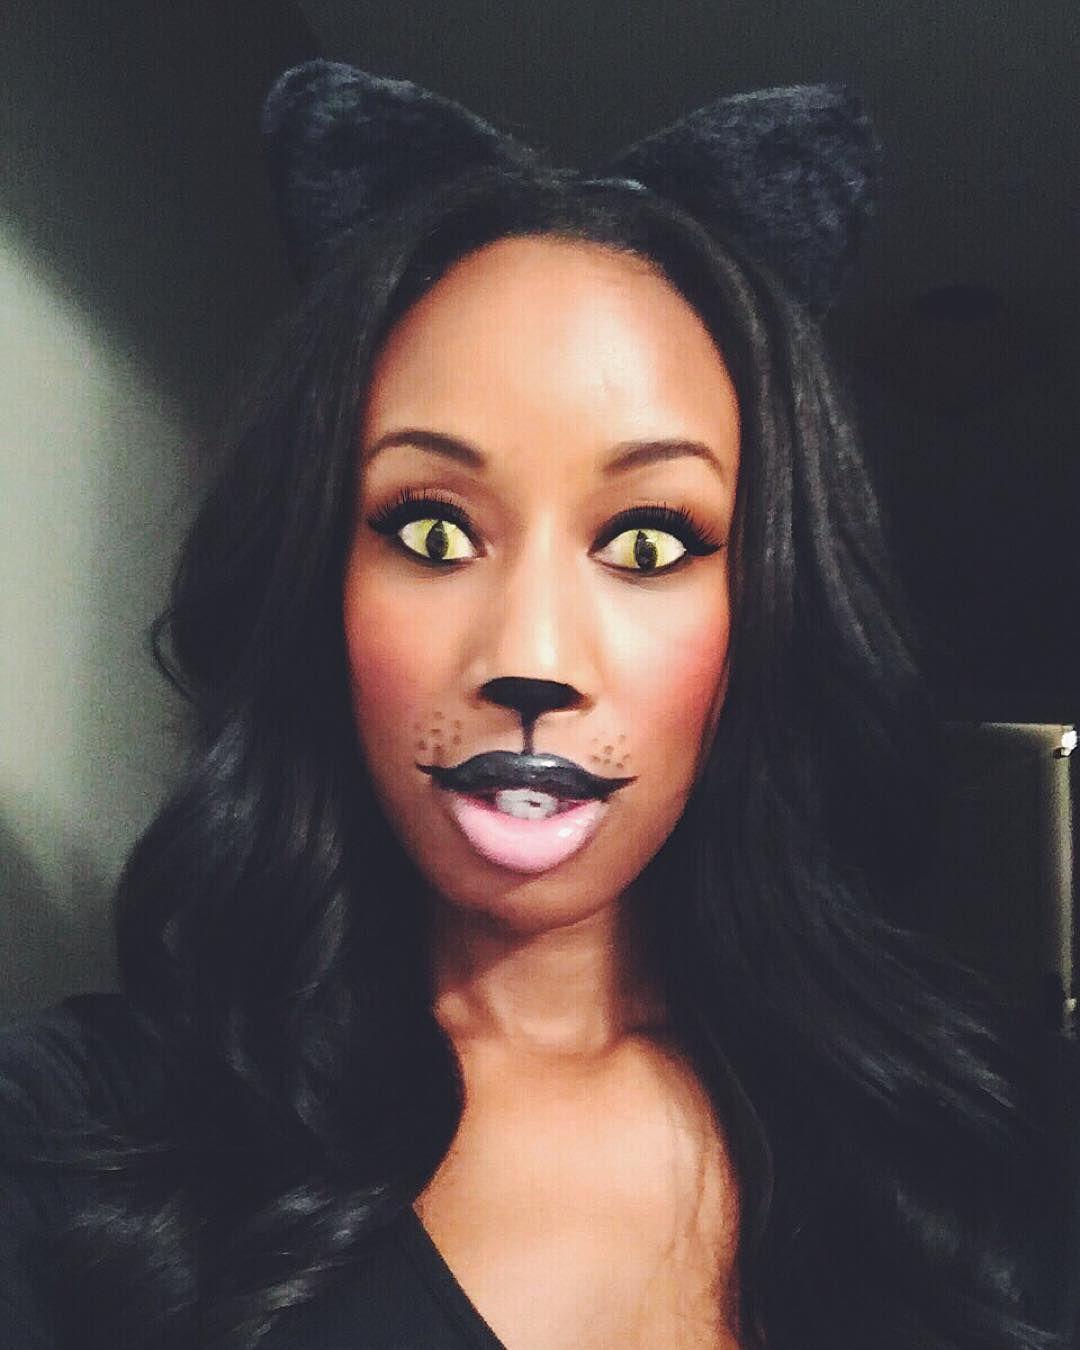 Black Cat Halloween Makeup Black Girl Yellow Cat Eye Contacts